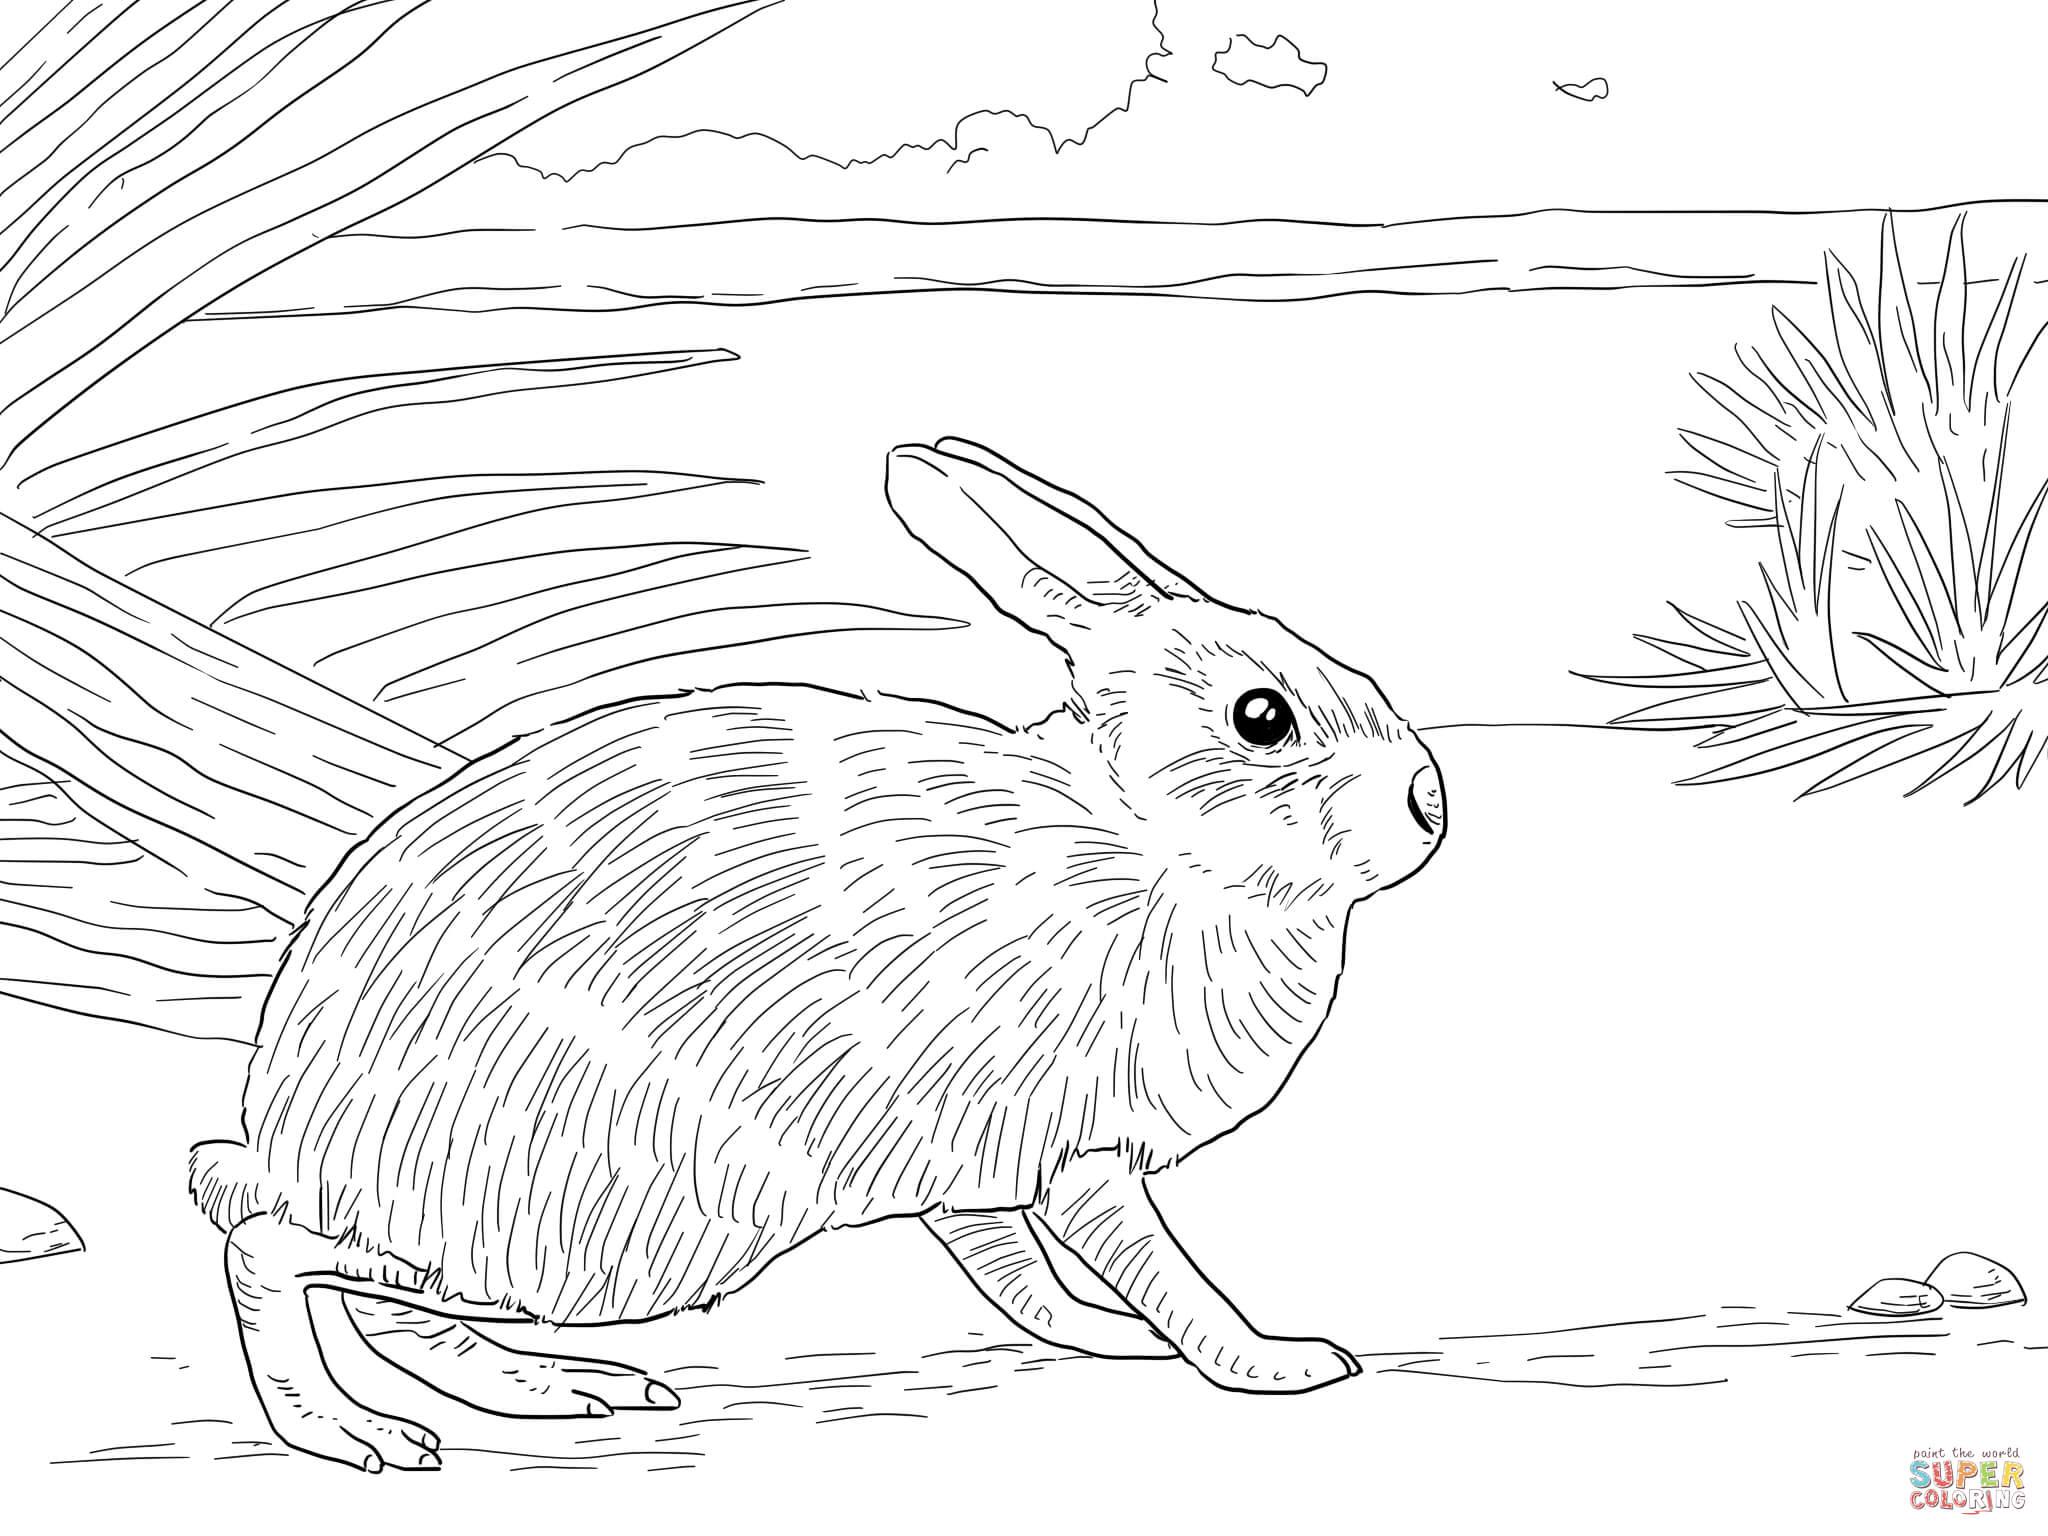 2048x1536 Pretentious Idea Rabbit Coloring Pages Rabbits Free